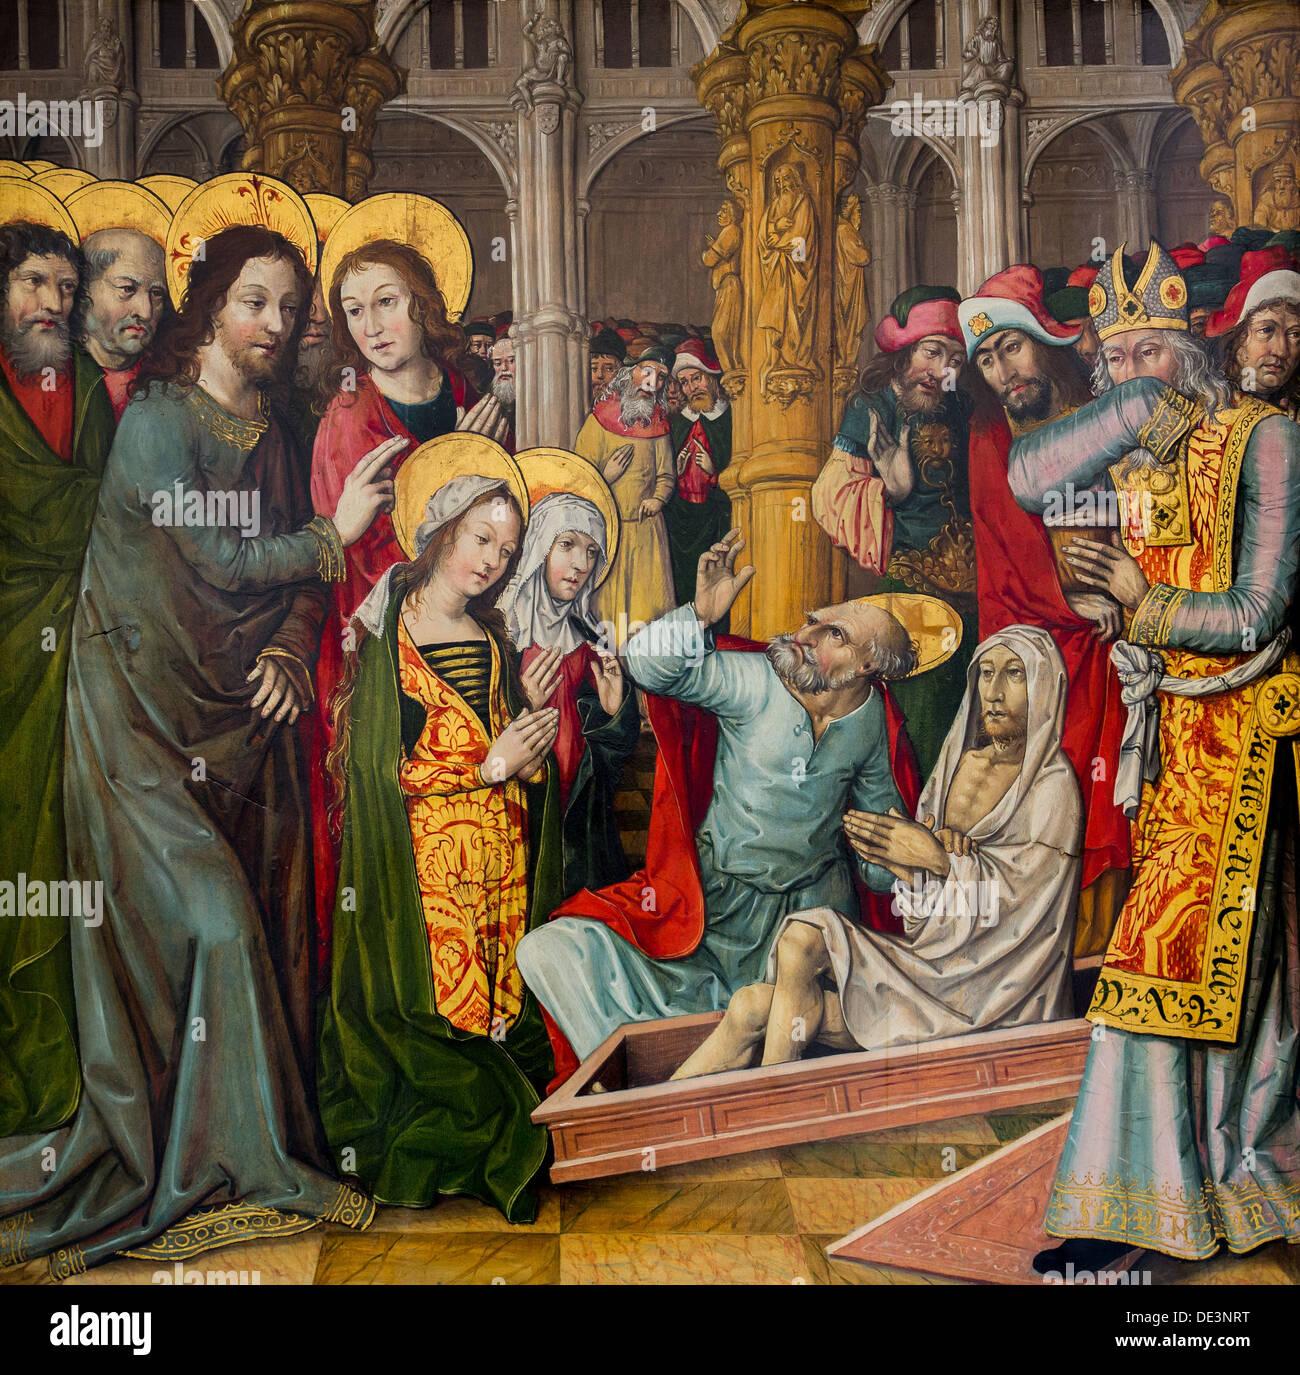 15th century  -  The Resurrection of Lazarus, around 1496 - Jacquelin de Montluçon Philippe Sauvan-Magnet / Active Museum - Stock Image